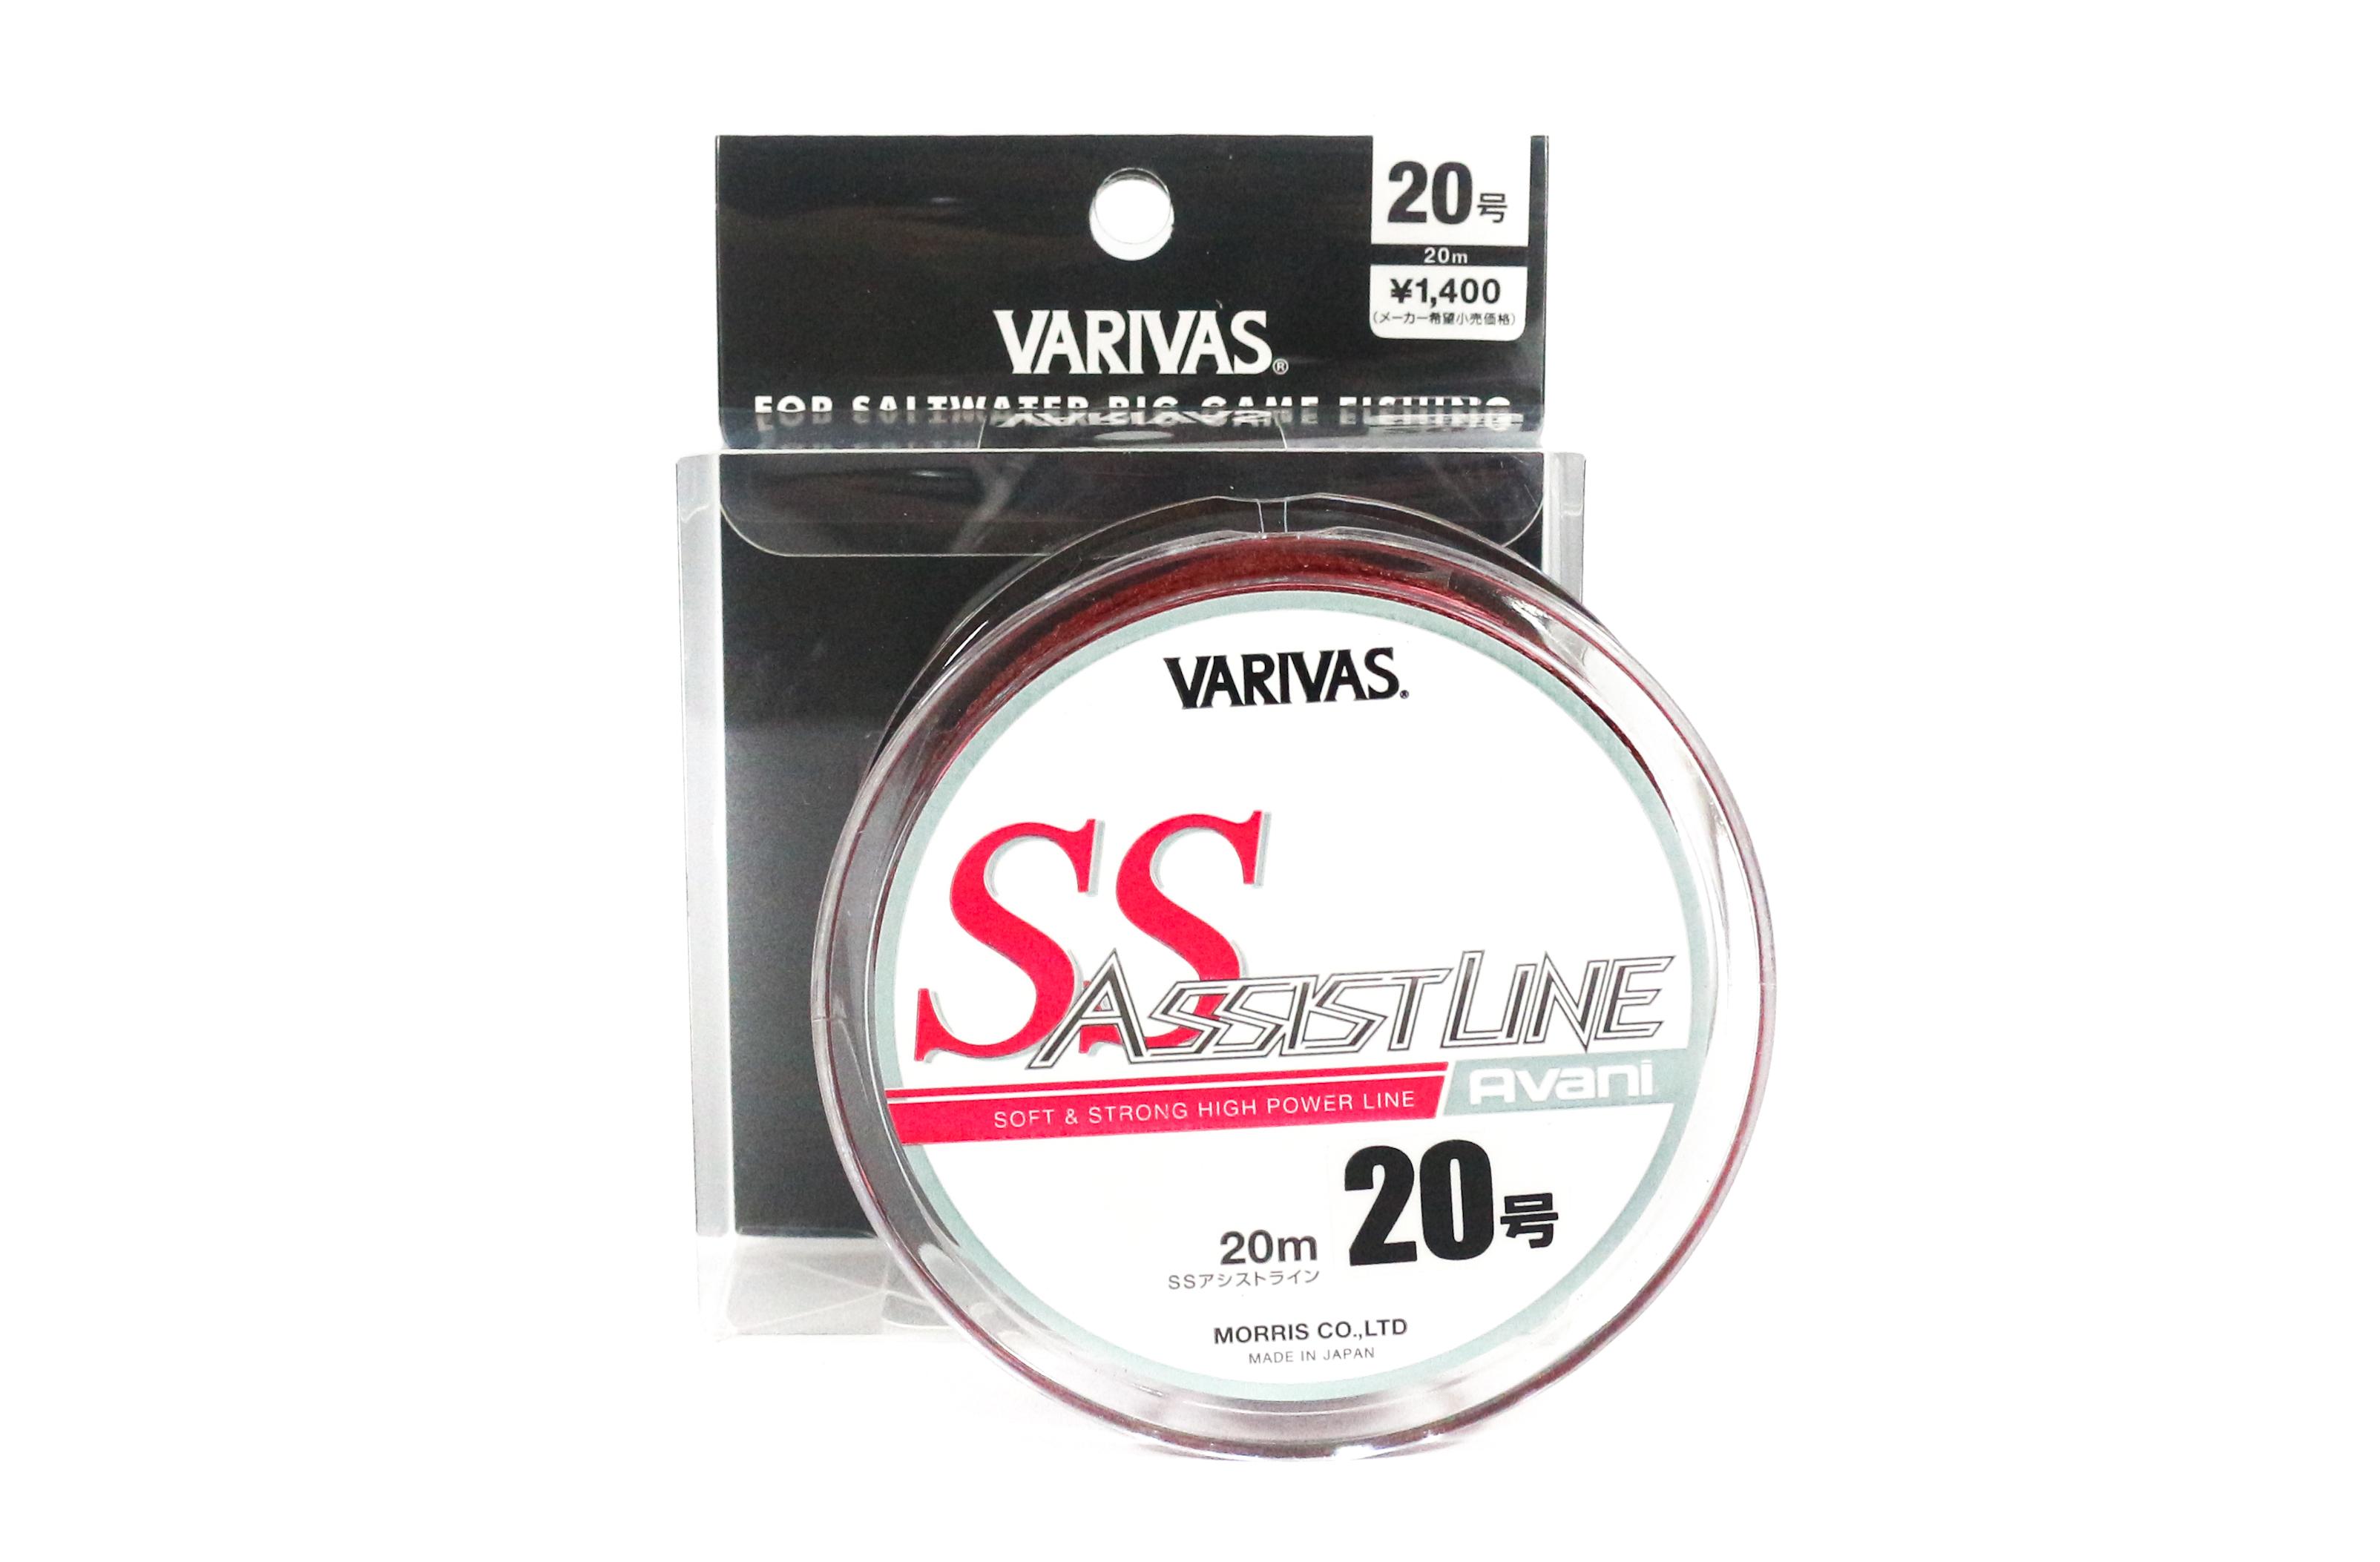 Varivas SS Assist Line 20m #20 100lb (3451)